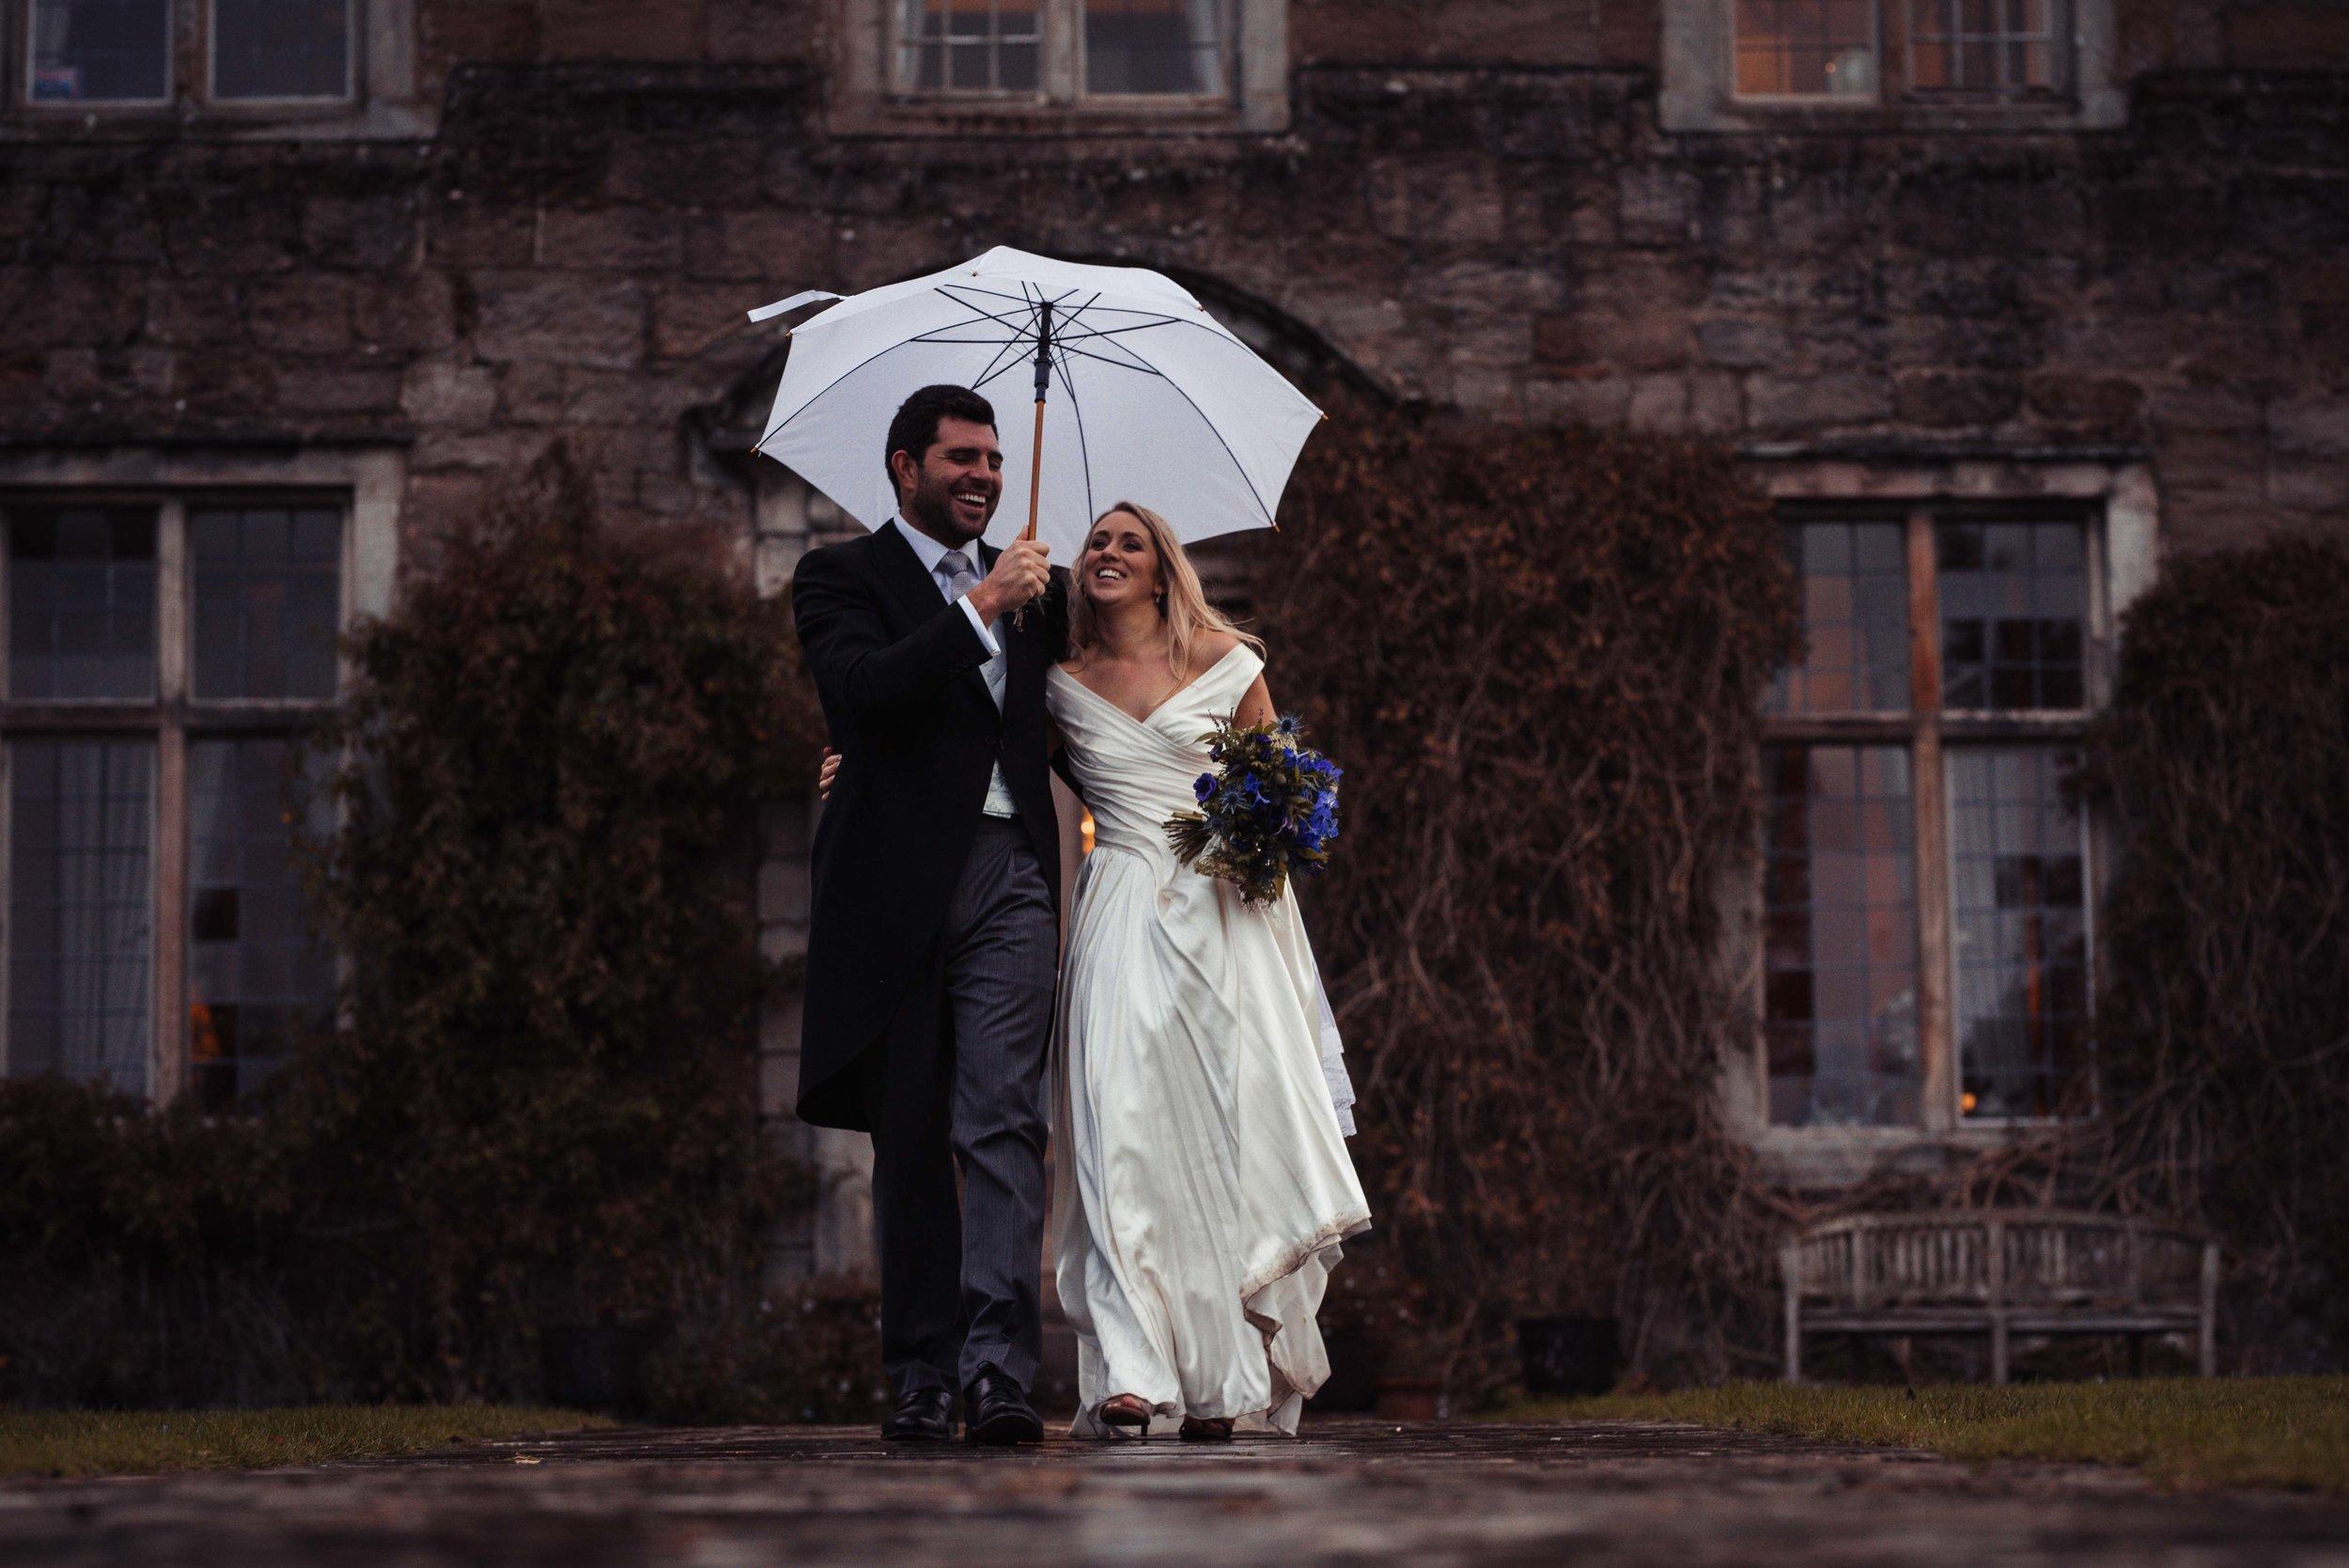 Askham-Hall-Wedding-Photography-72.jpg